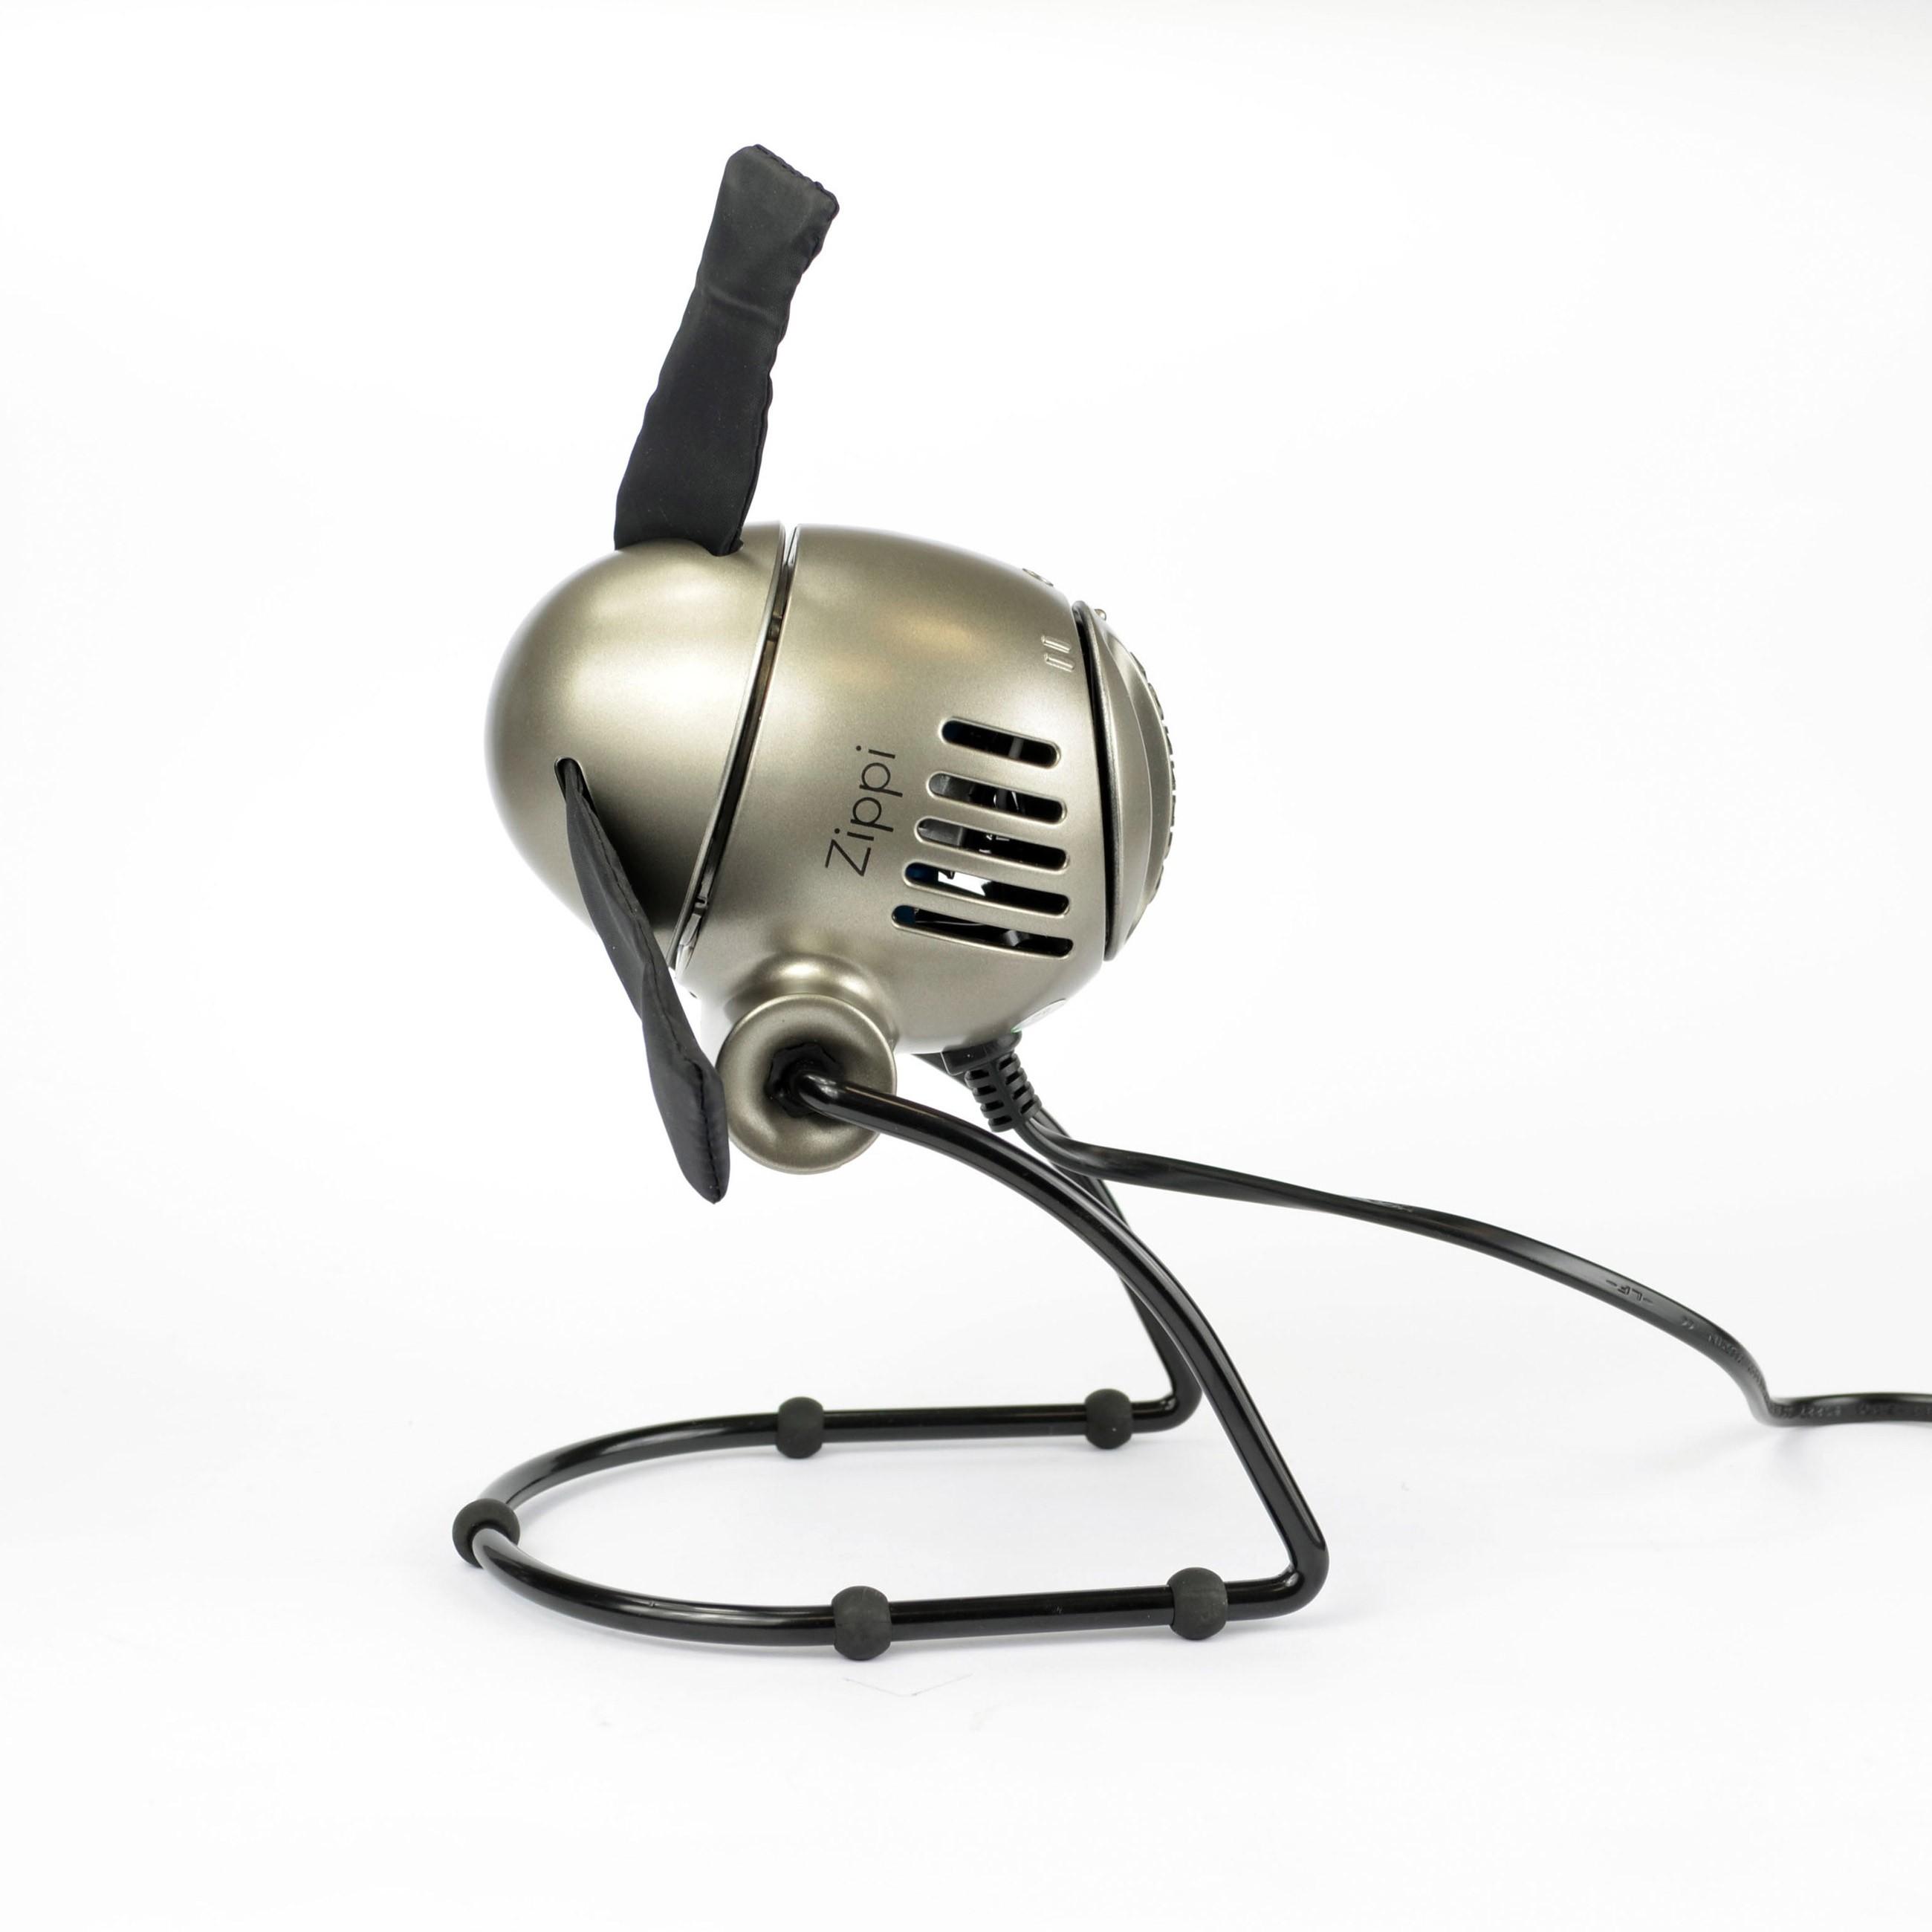 Ventilator / Tischventilator Vornado Zippi klappbar silber Ø 18,8cm Bild 1